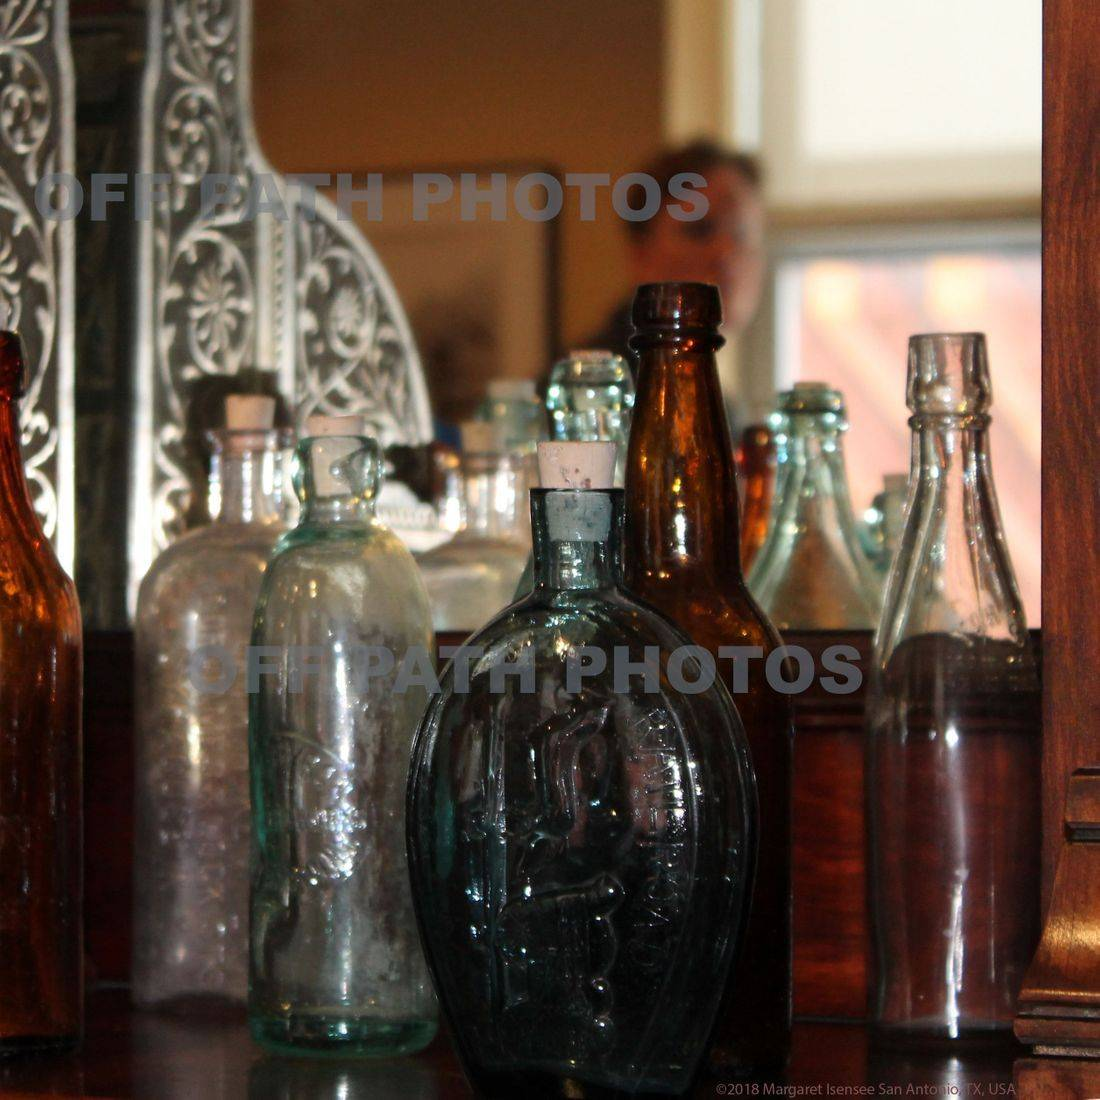 photography, alcoholic, bottle, addiction, mirror reflection, drinking, habit, drug, person